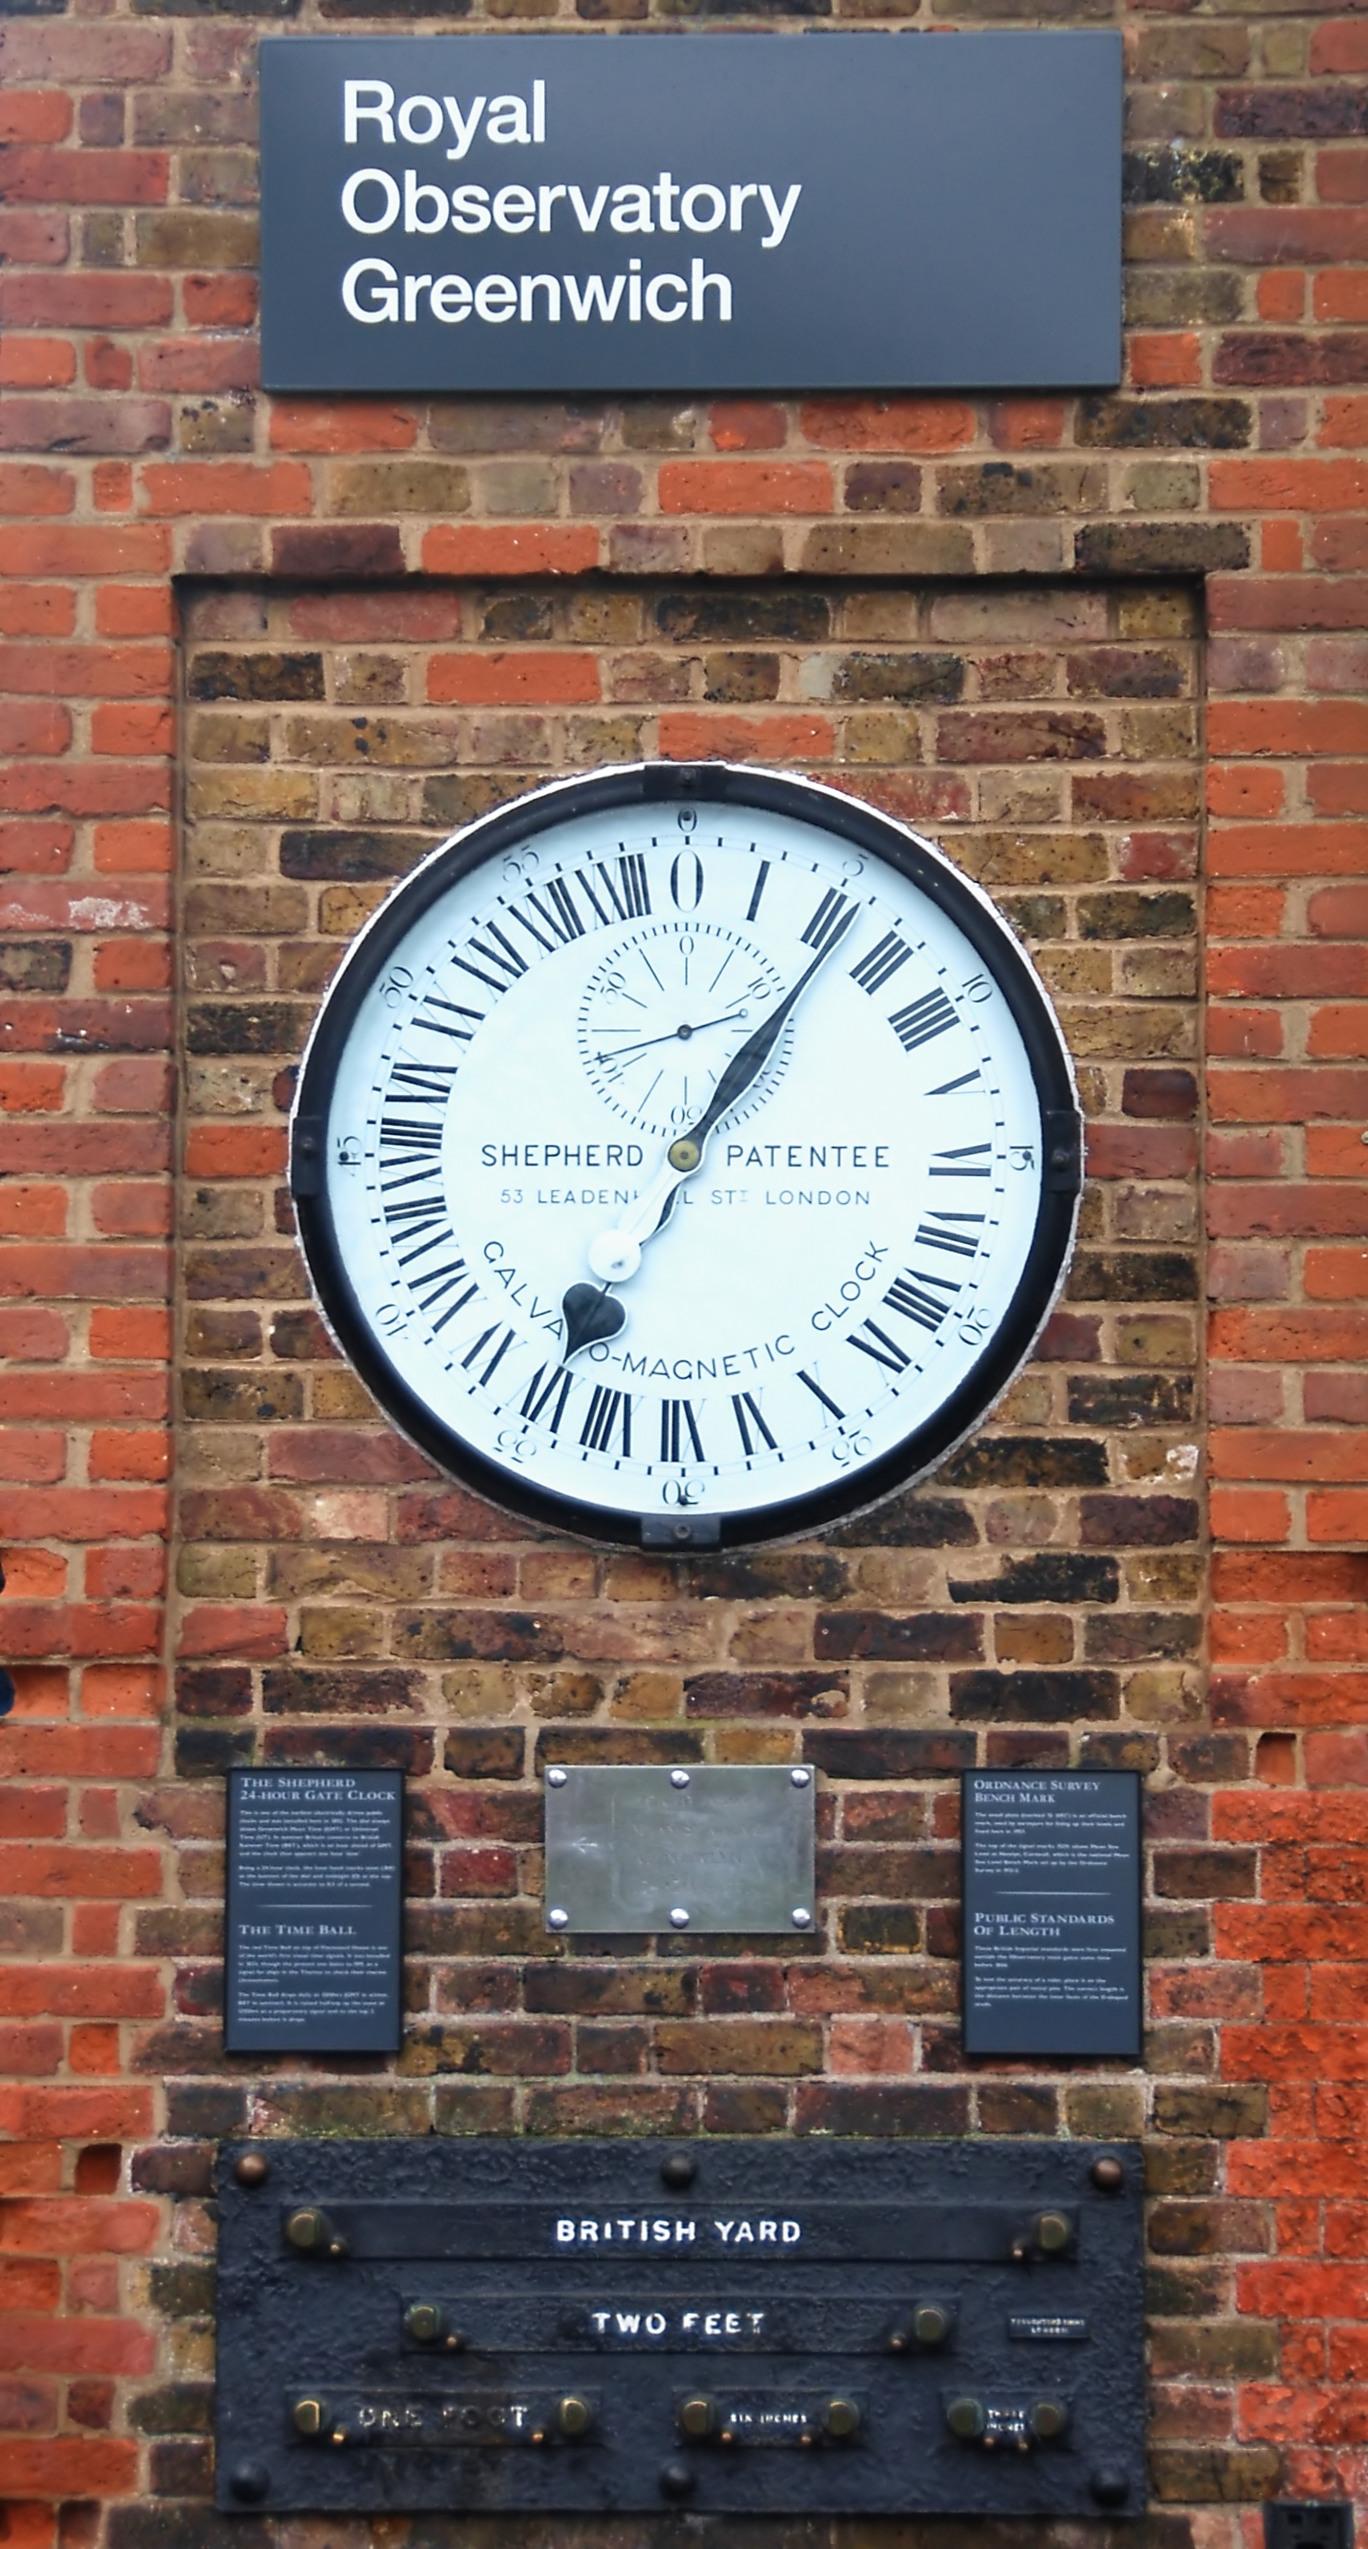 resynchronizing cuckoo clocks